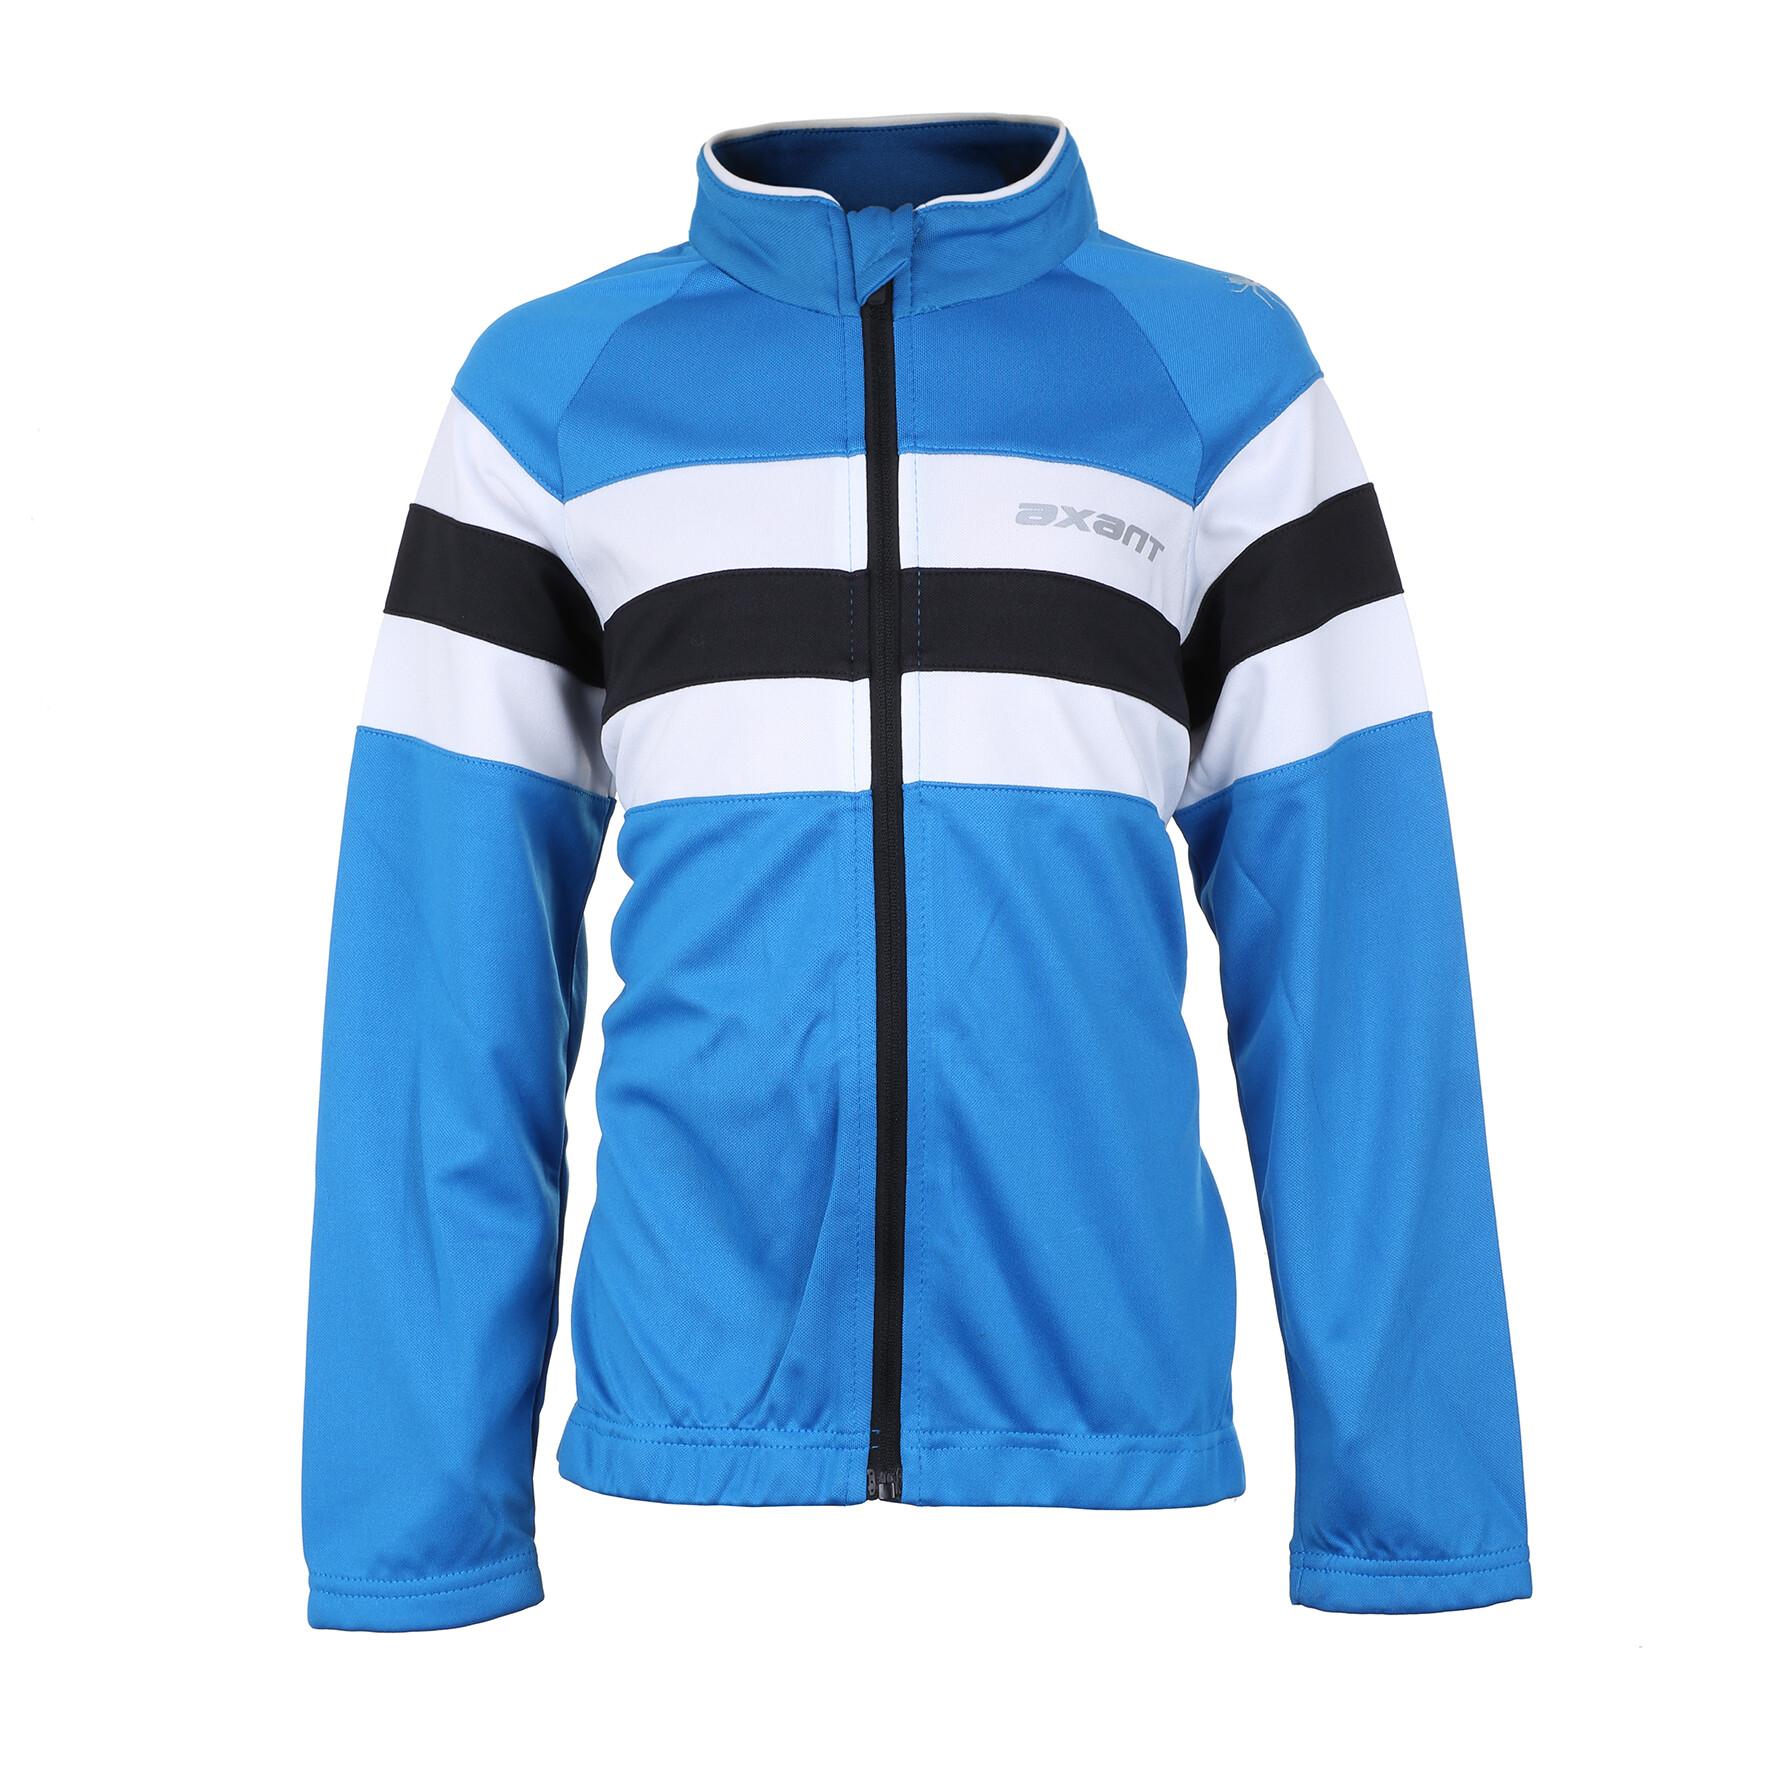 axant Expert Thermo Langærmet cykeltrøje Børn, blue (2019) | Jerseys